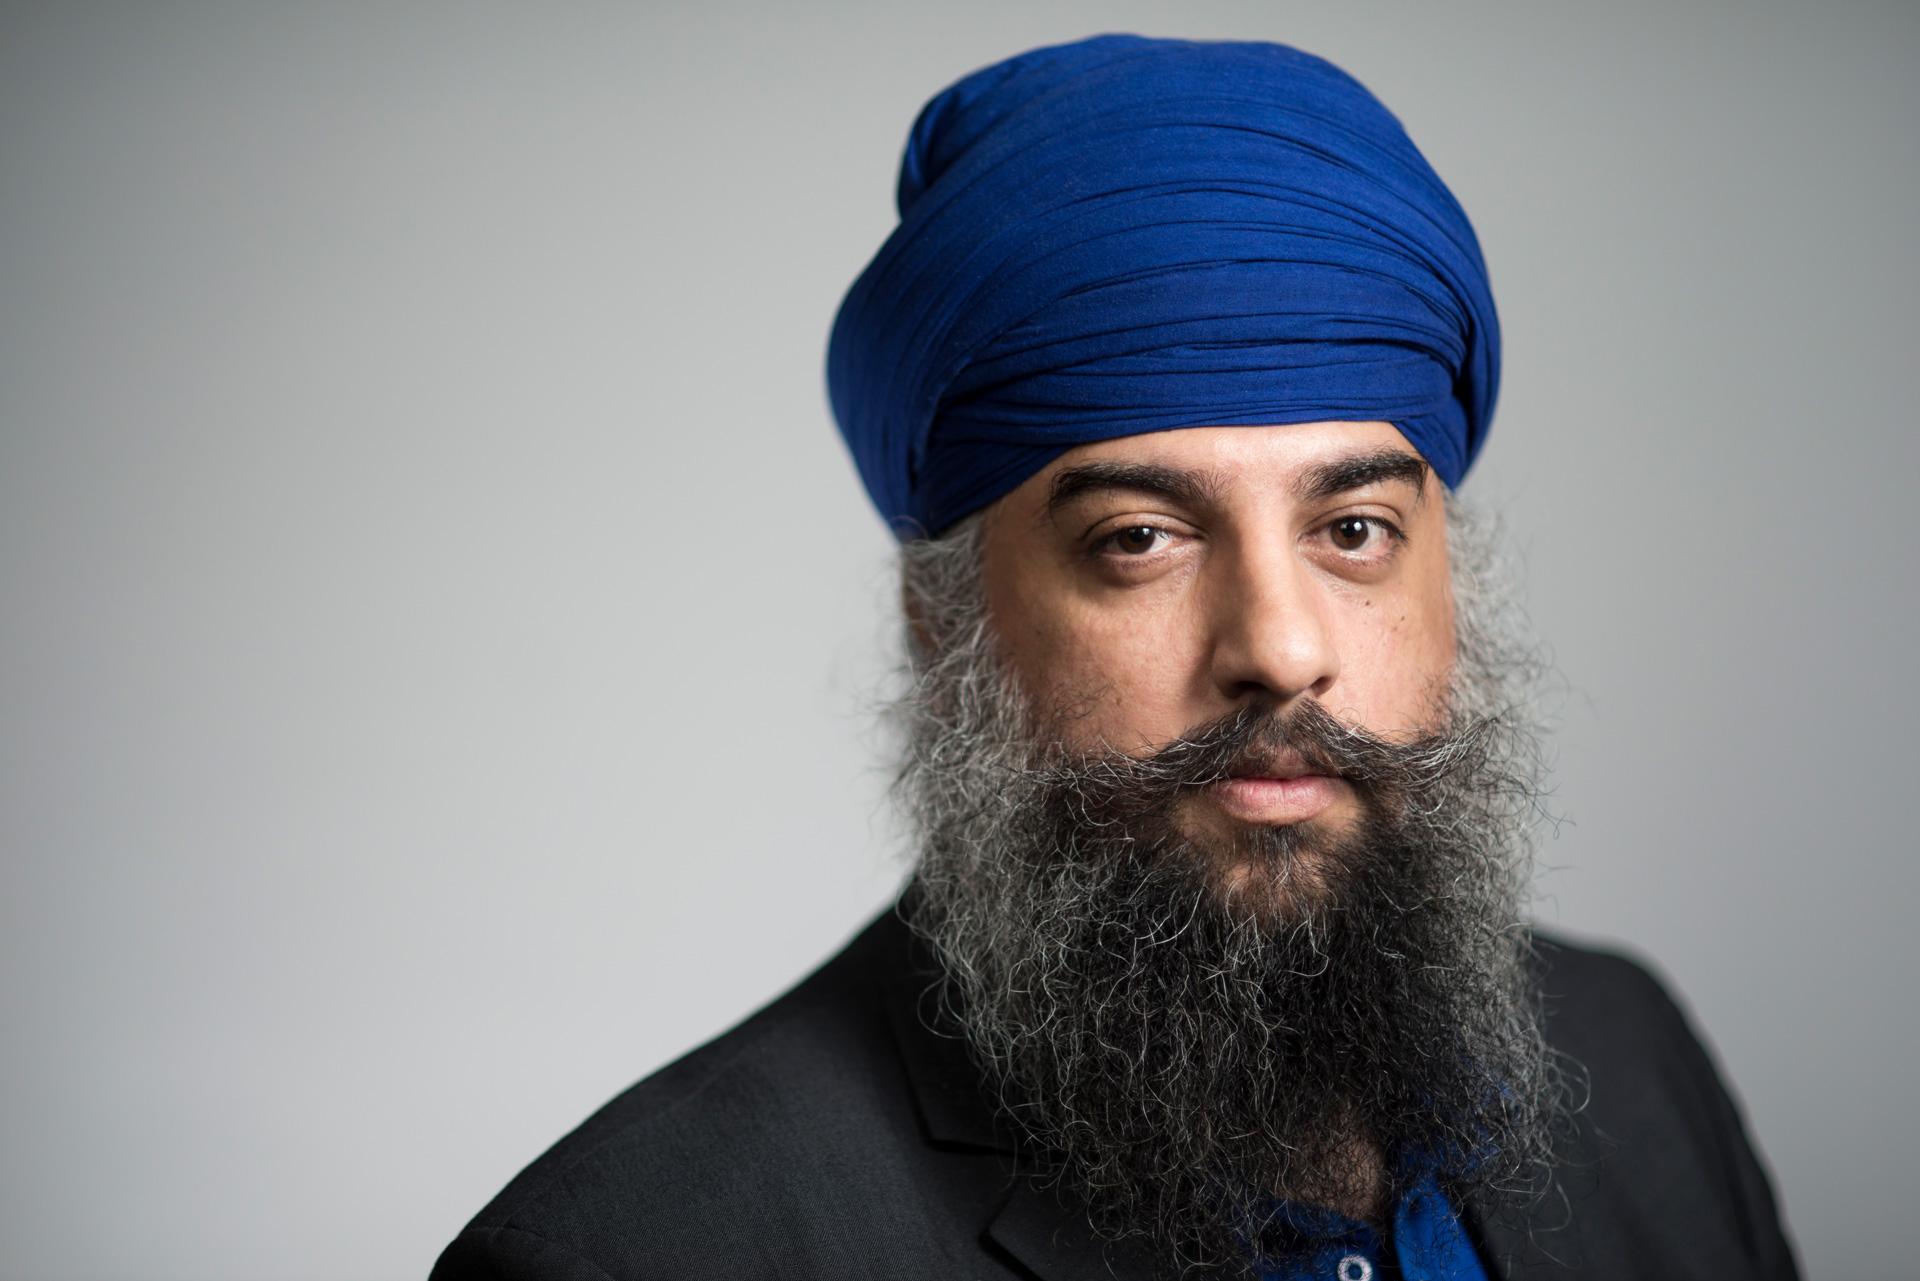 Member of Impact Hub Islington - Portraits and Headshots by Chris King